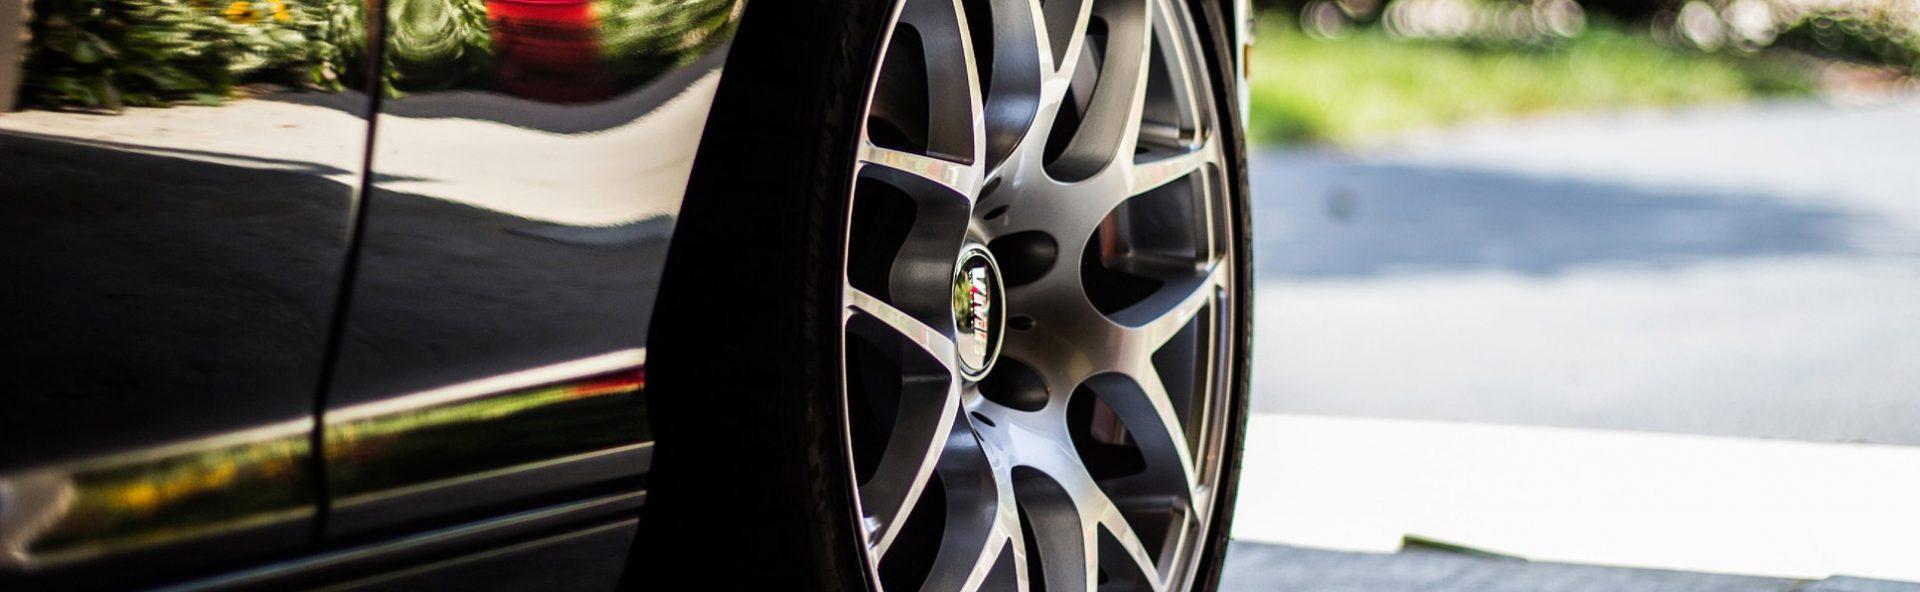 Vente et installation de pneus